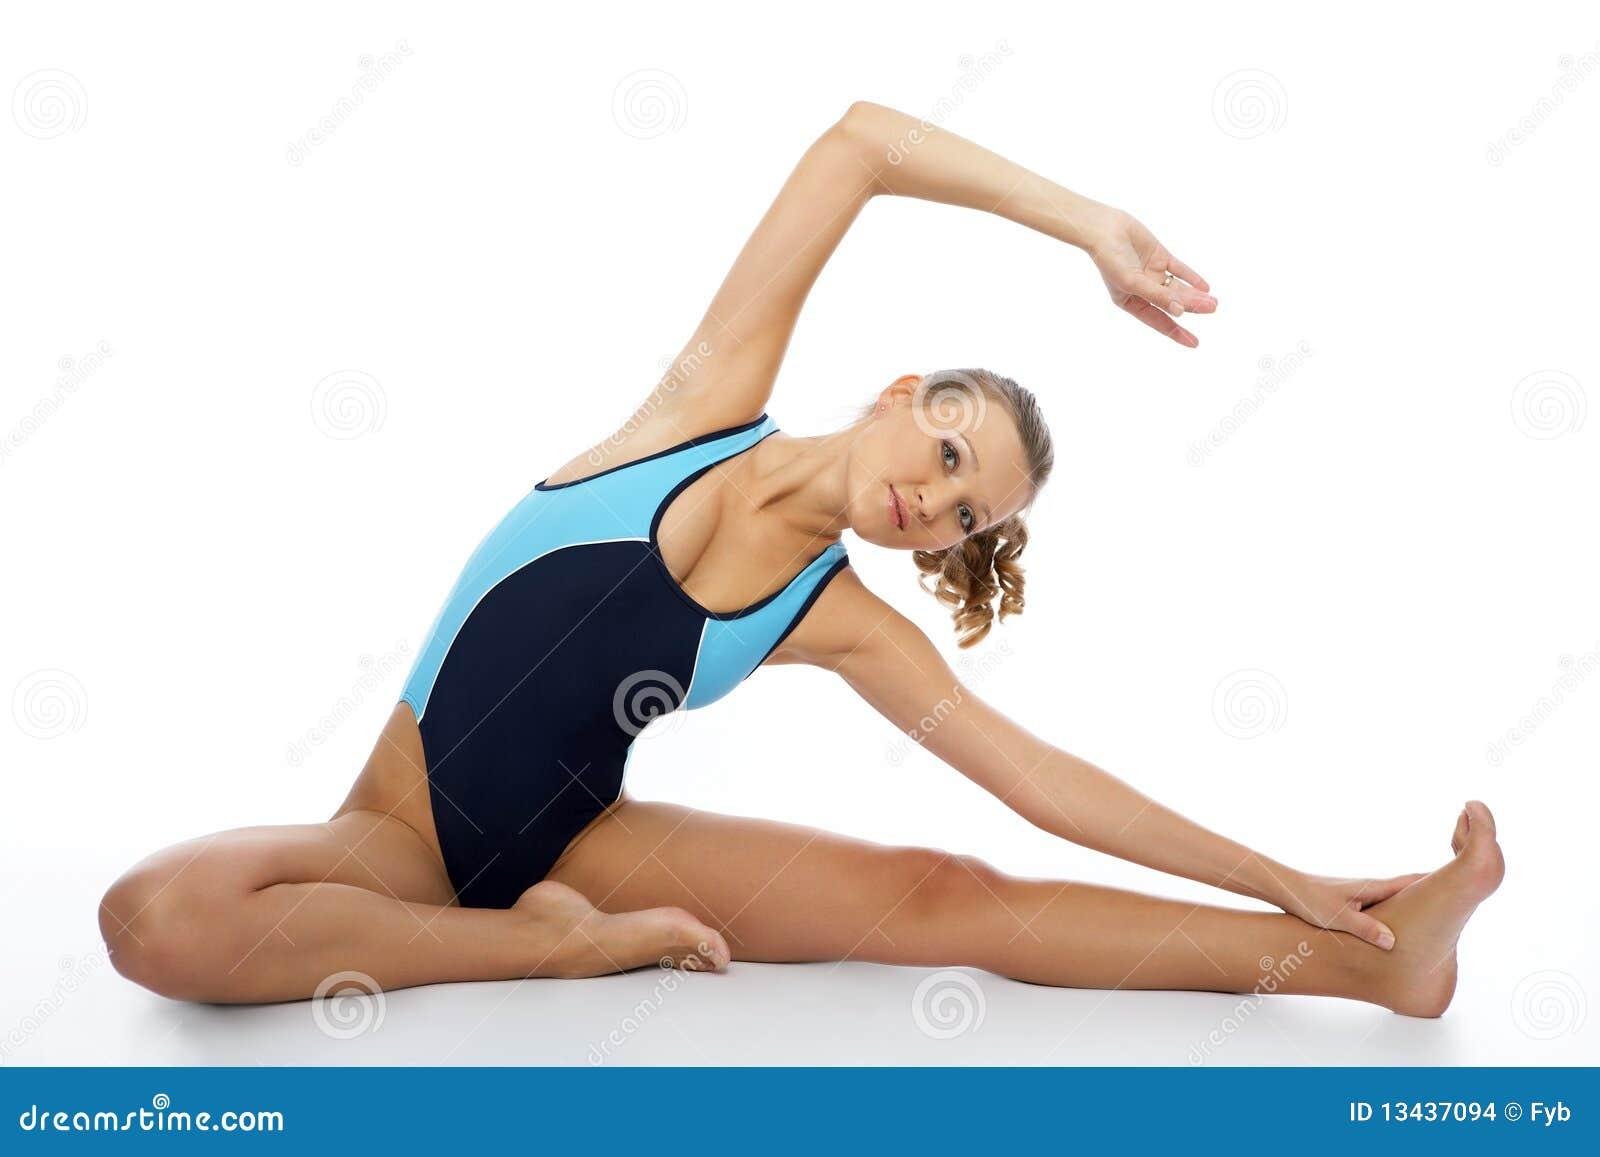 Erotic exercise video